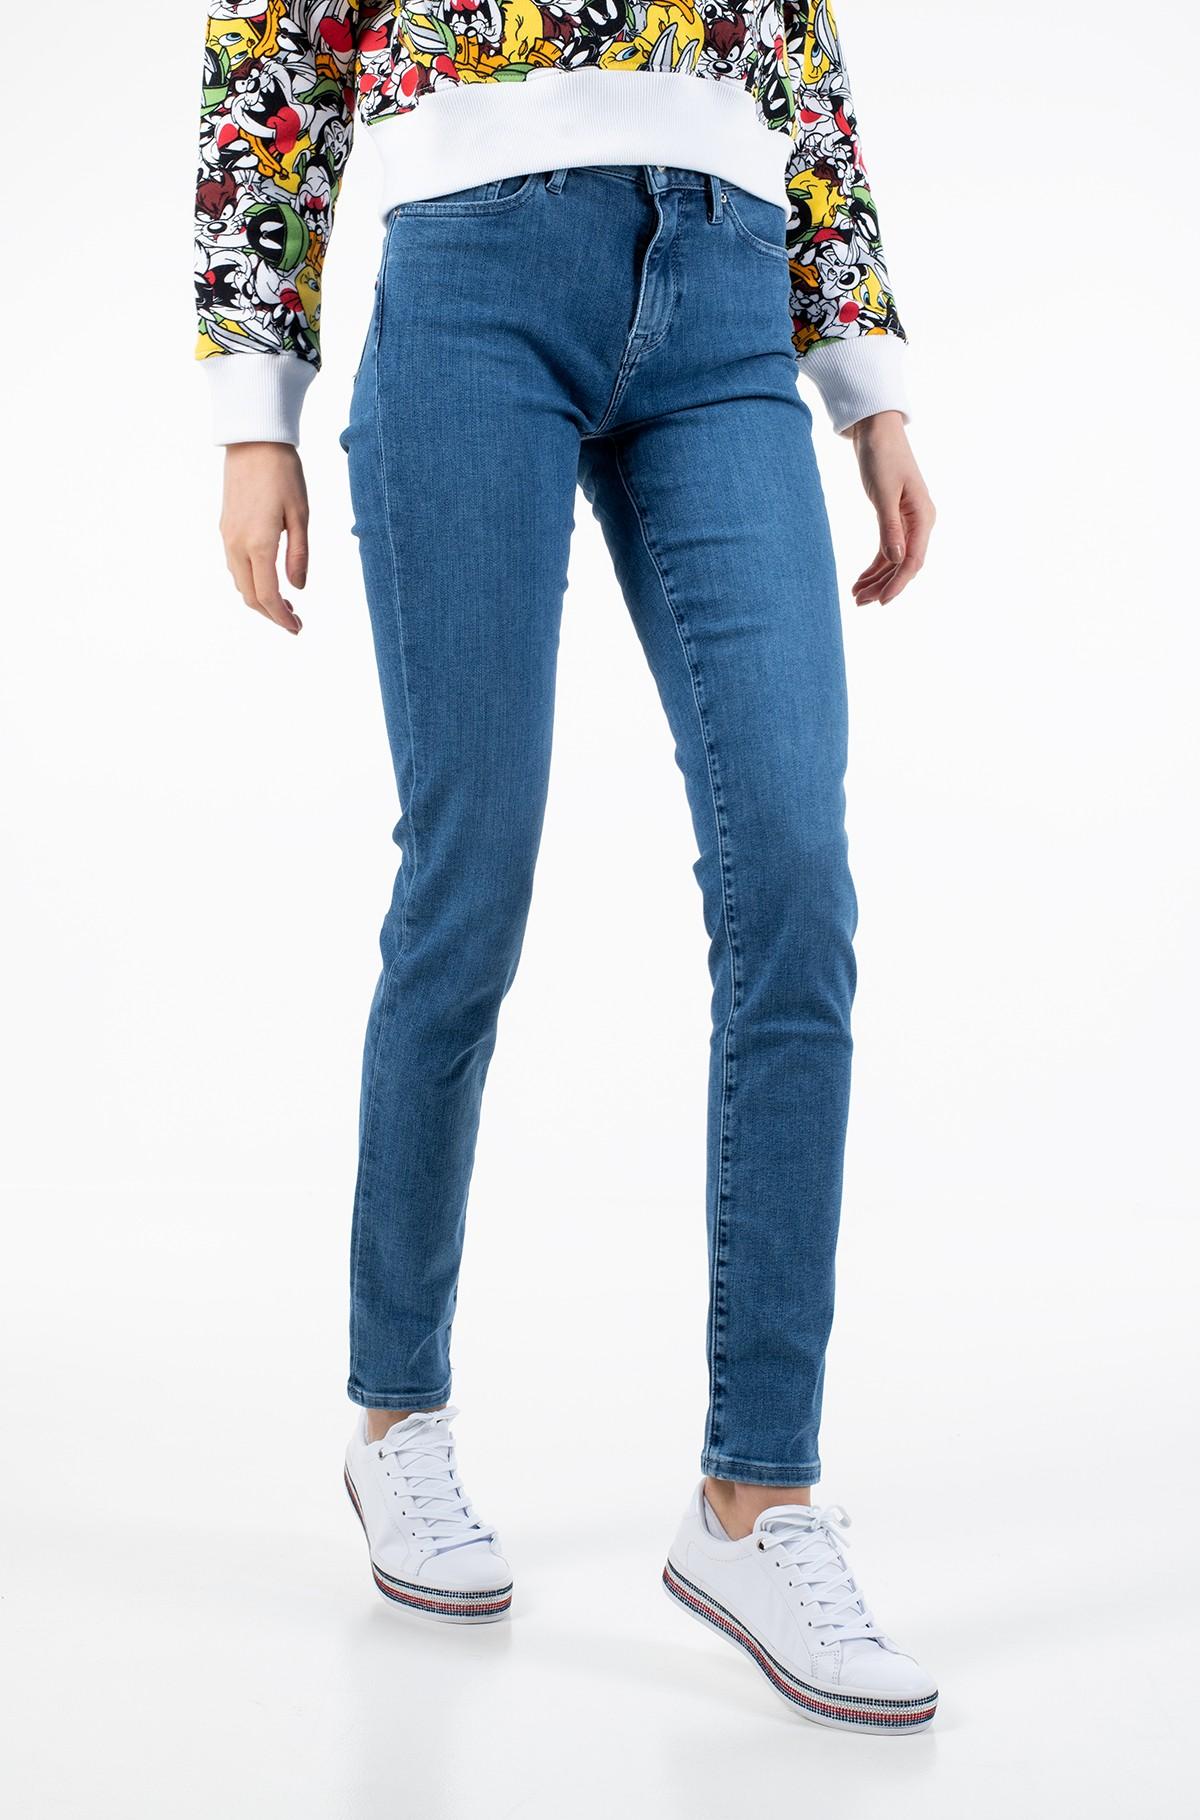 Jeans TH FLEX VENICE SLIM RW BETTY-full-1